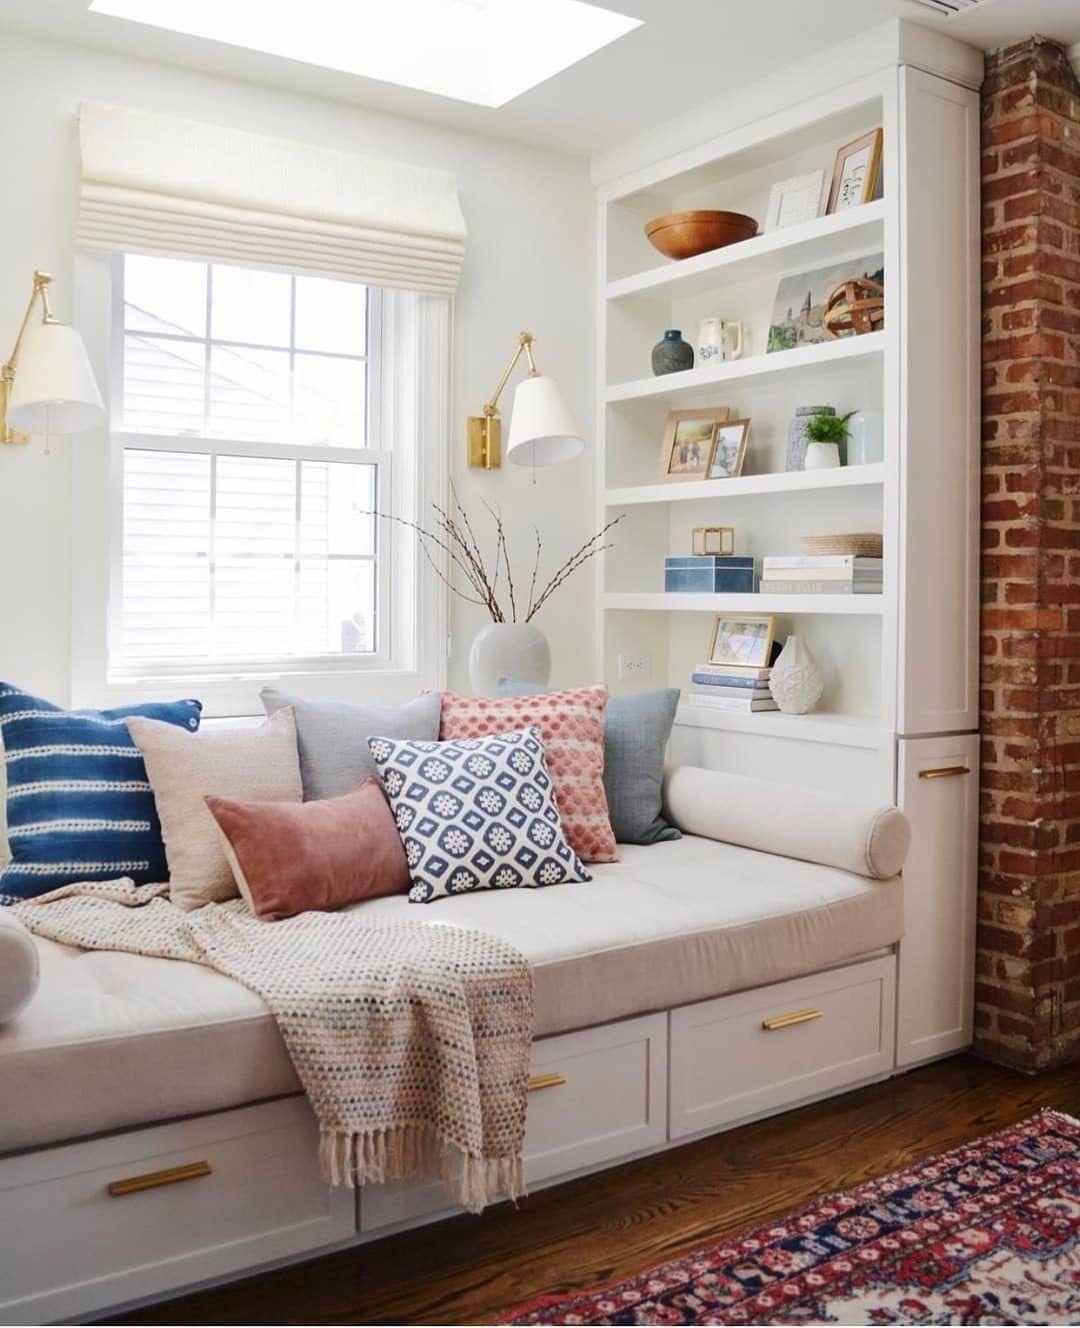 16 Minimalist Home Organization & Decluttering Tips